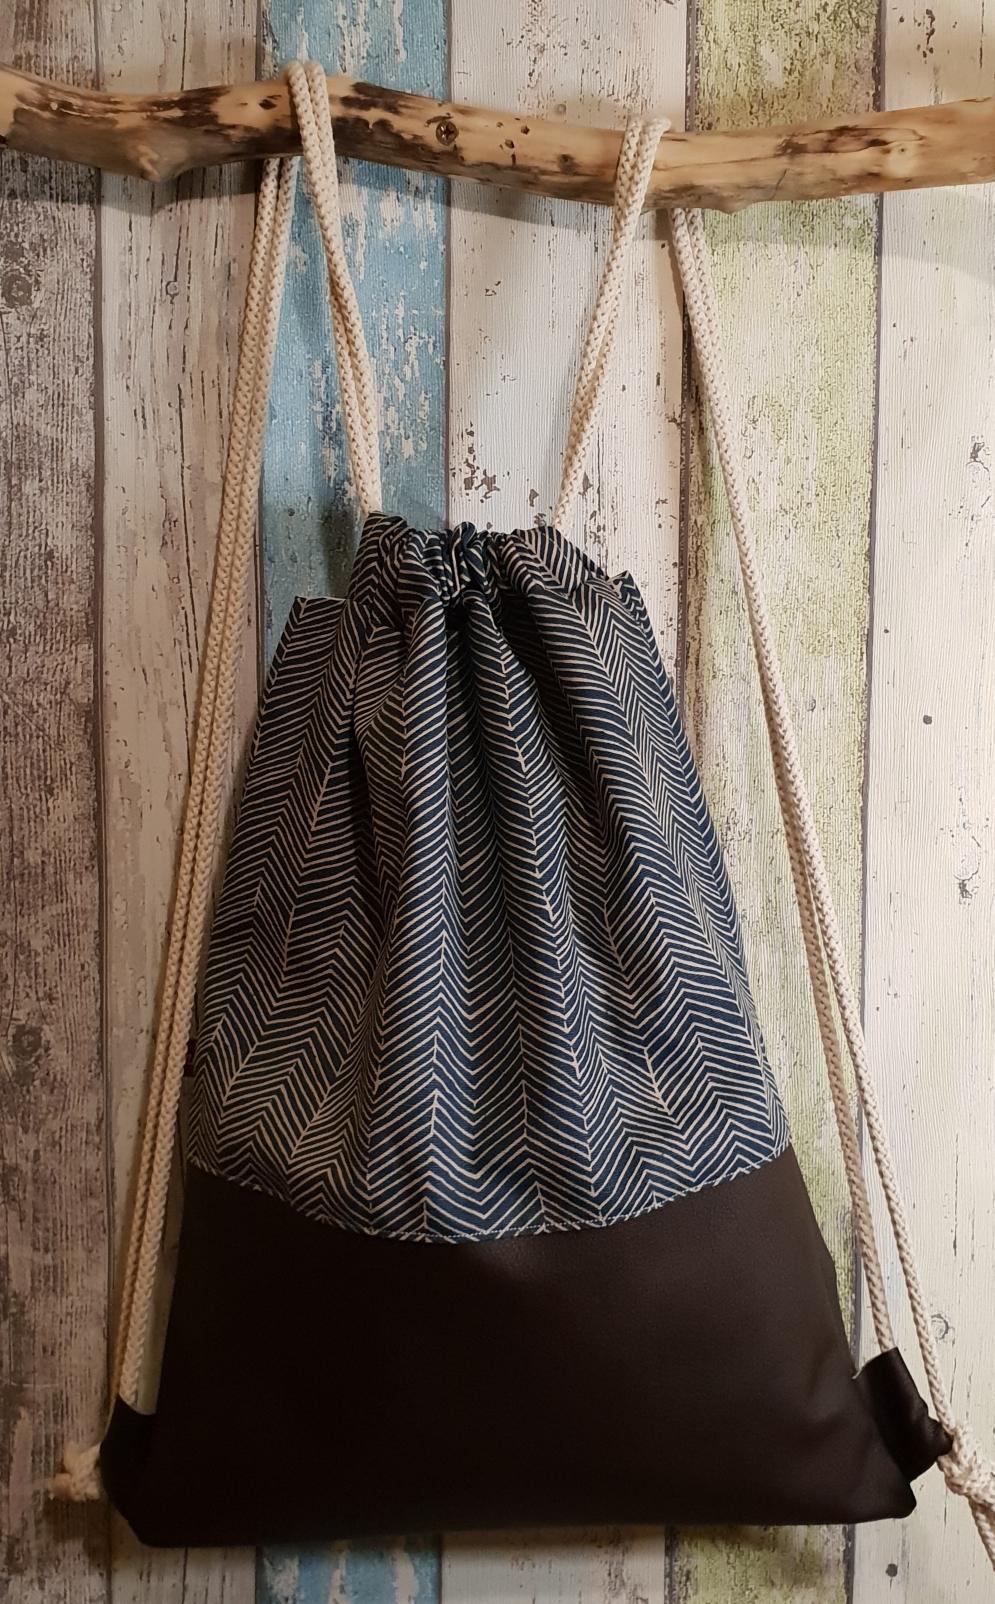 Muster/Leder braun